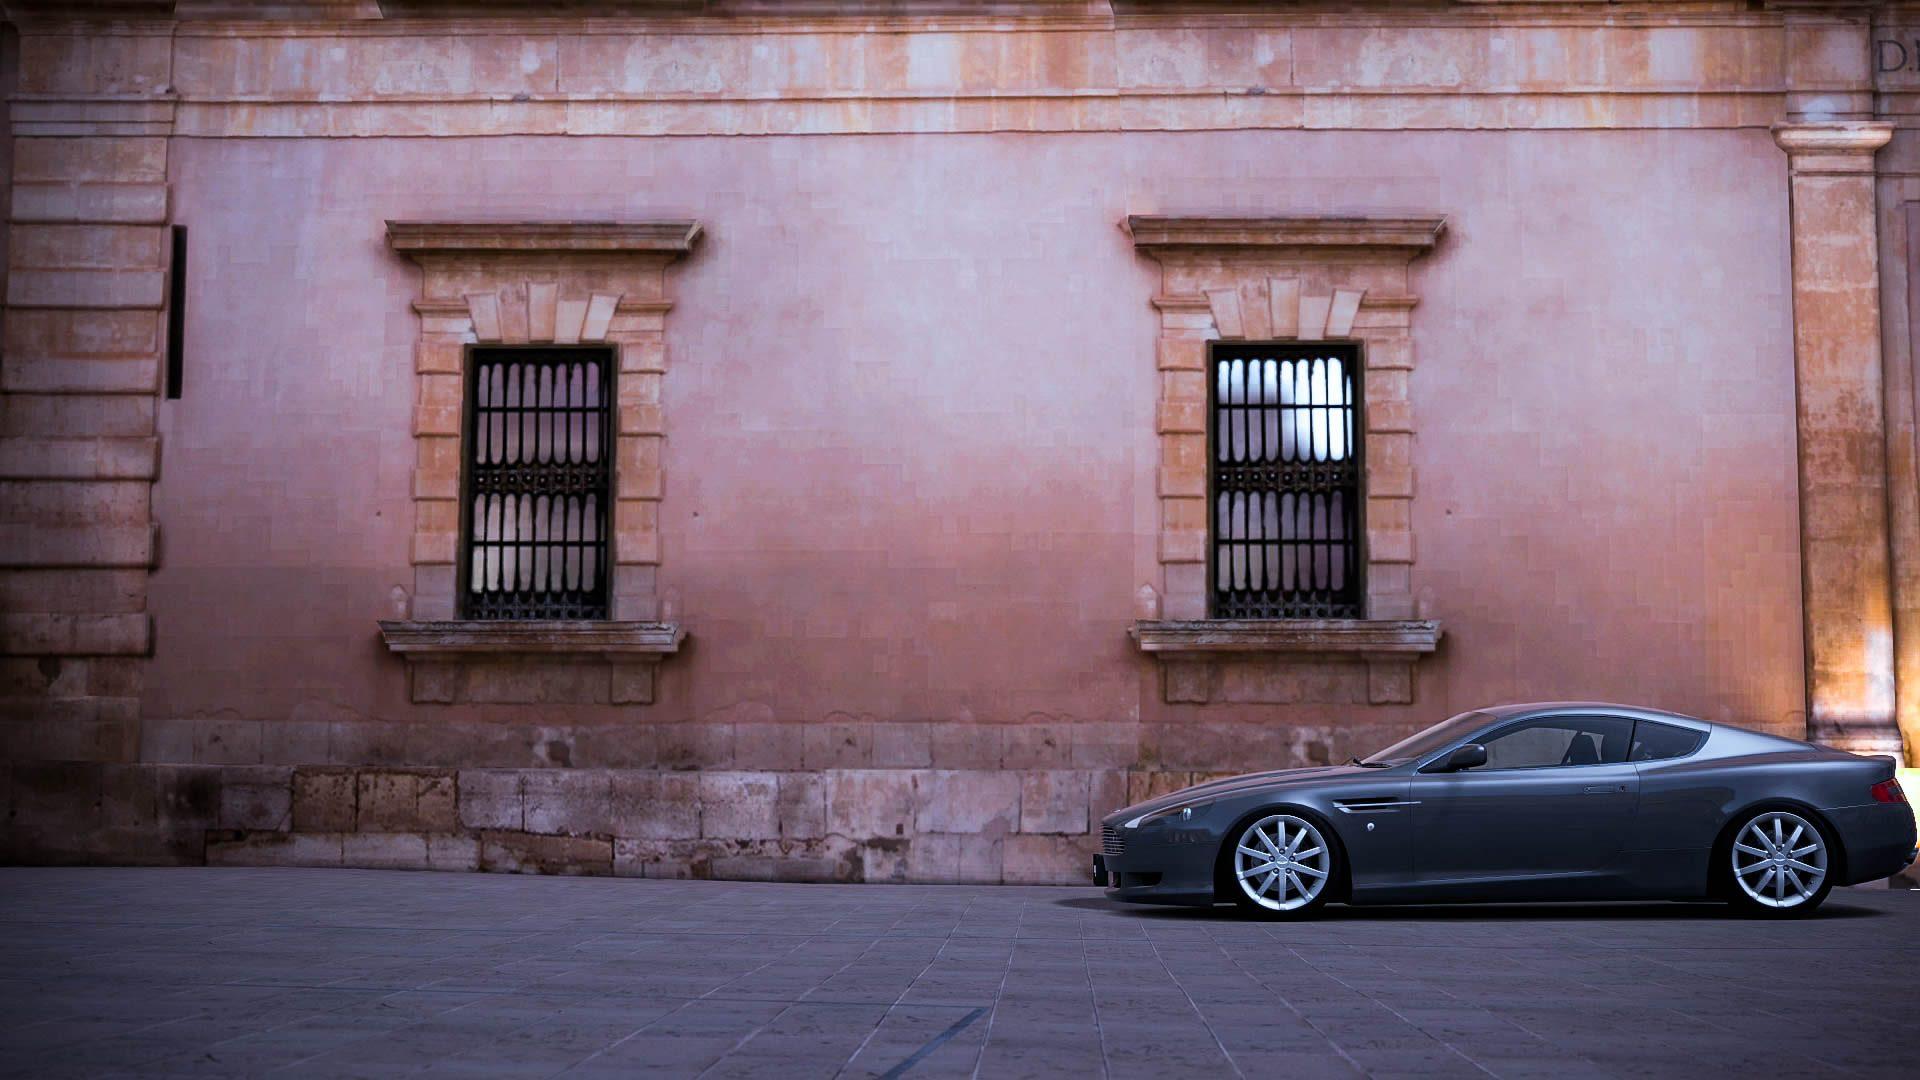 AstonMartin_Italy_7.jpg